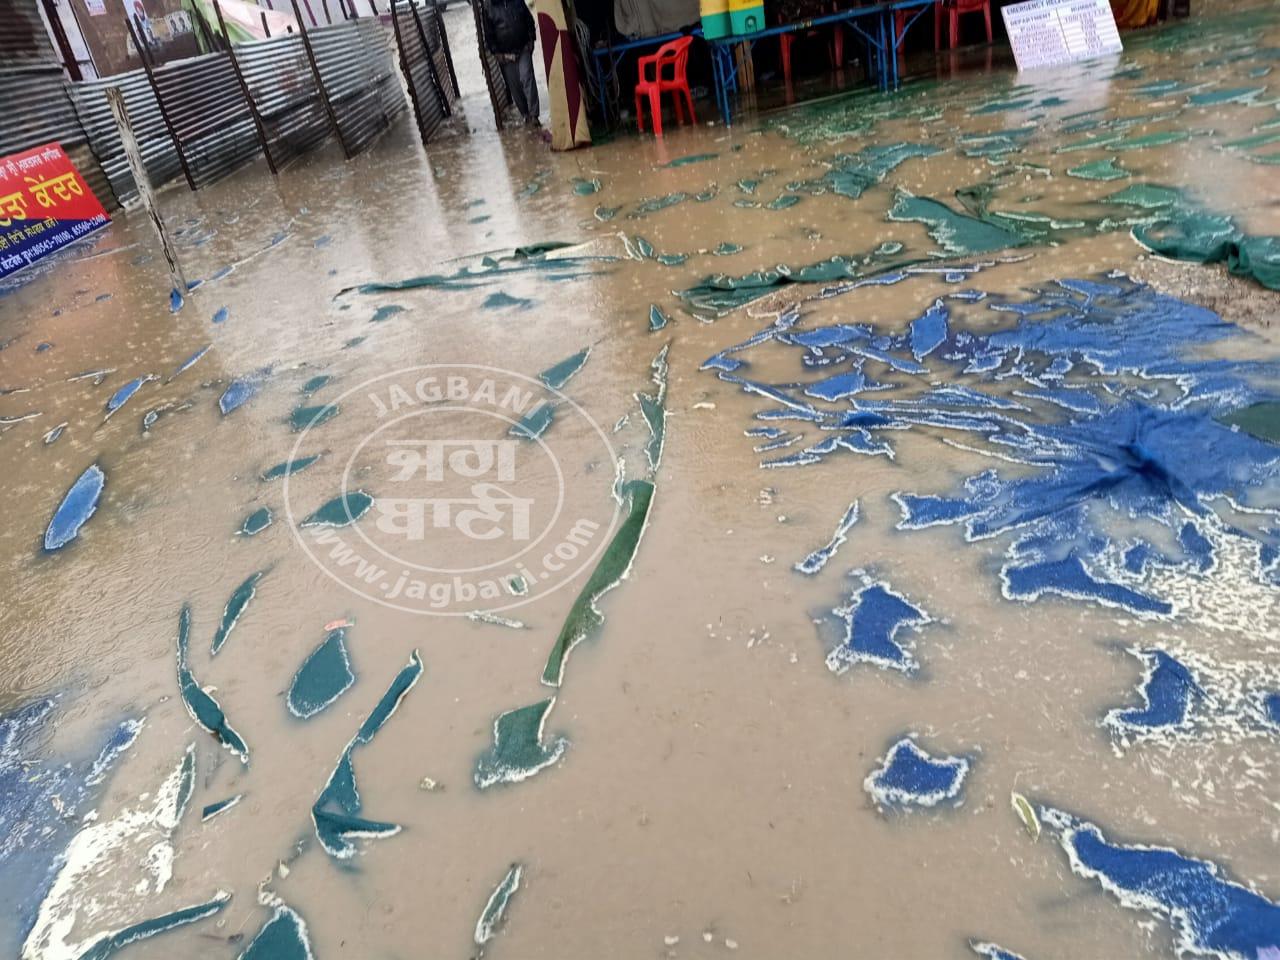 PunjabKesari, raining spoiled Magh Mela